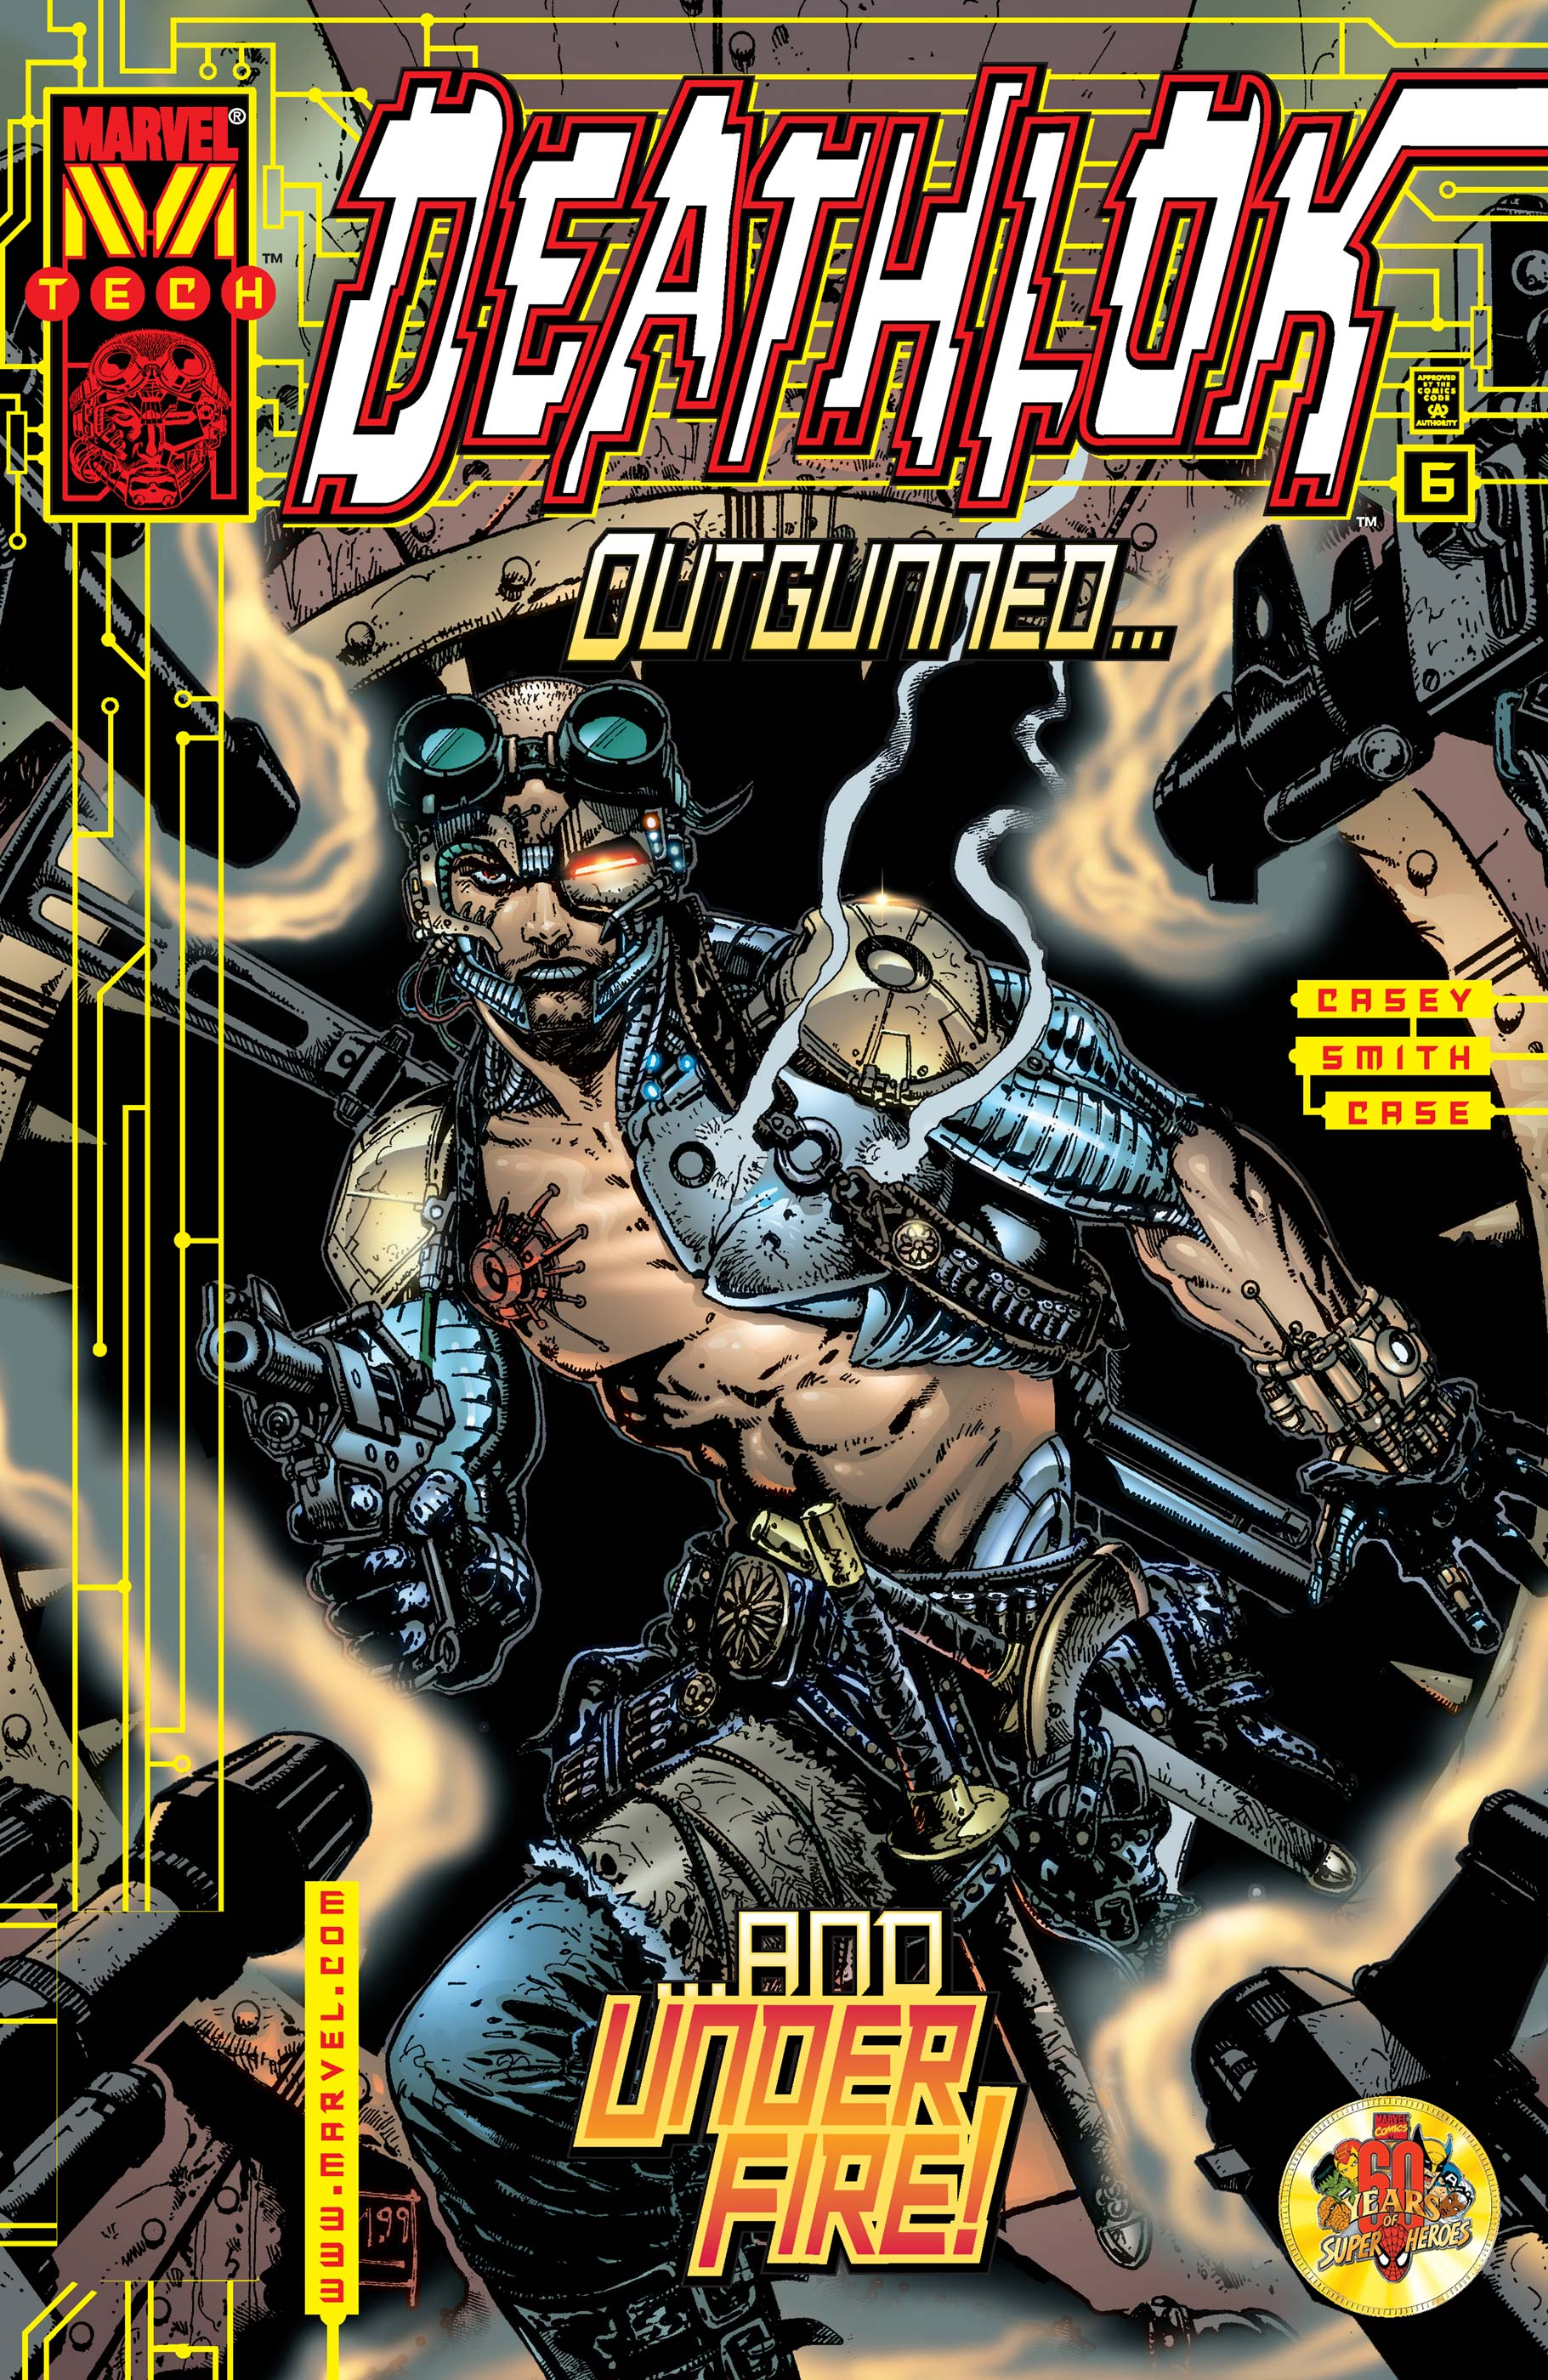 Deathlok (1999) #6